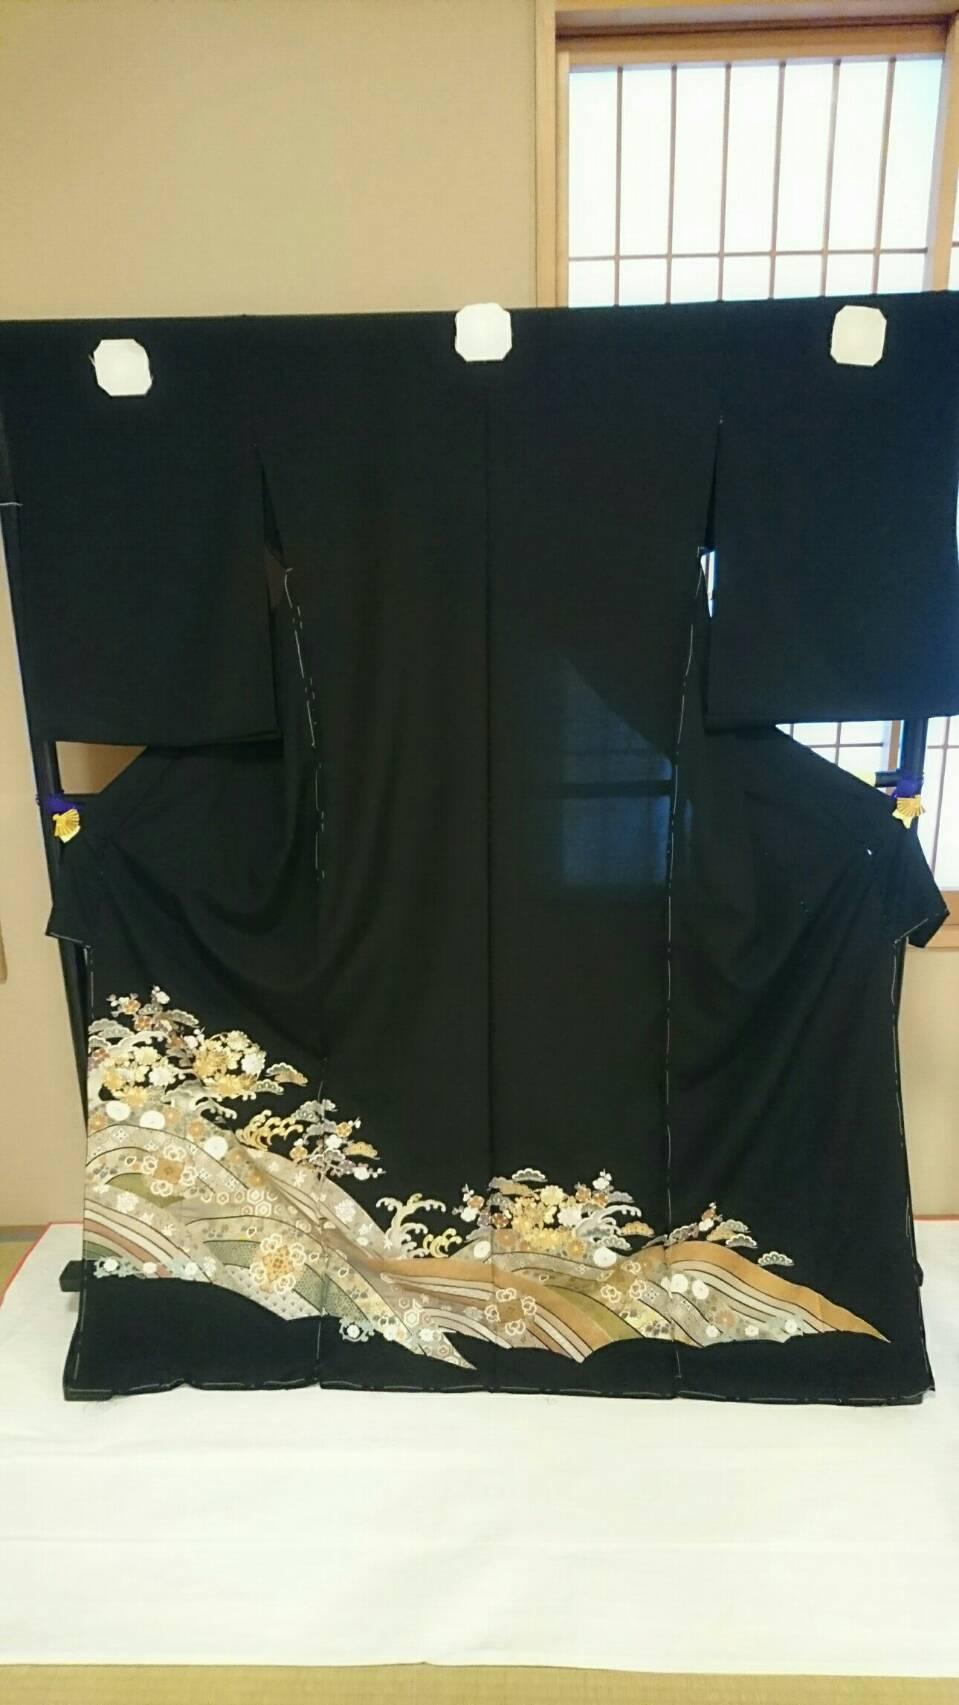 菅原呉服店の黒留袖①